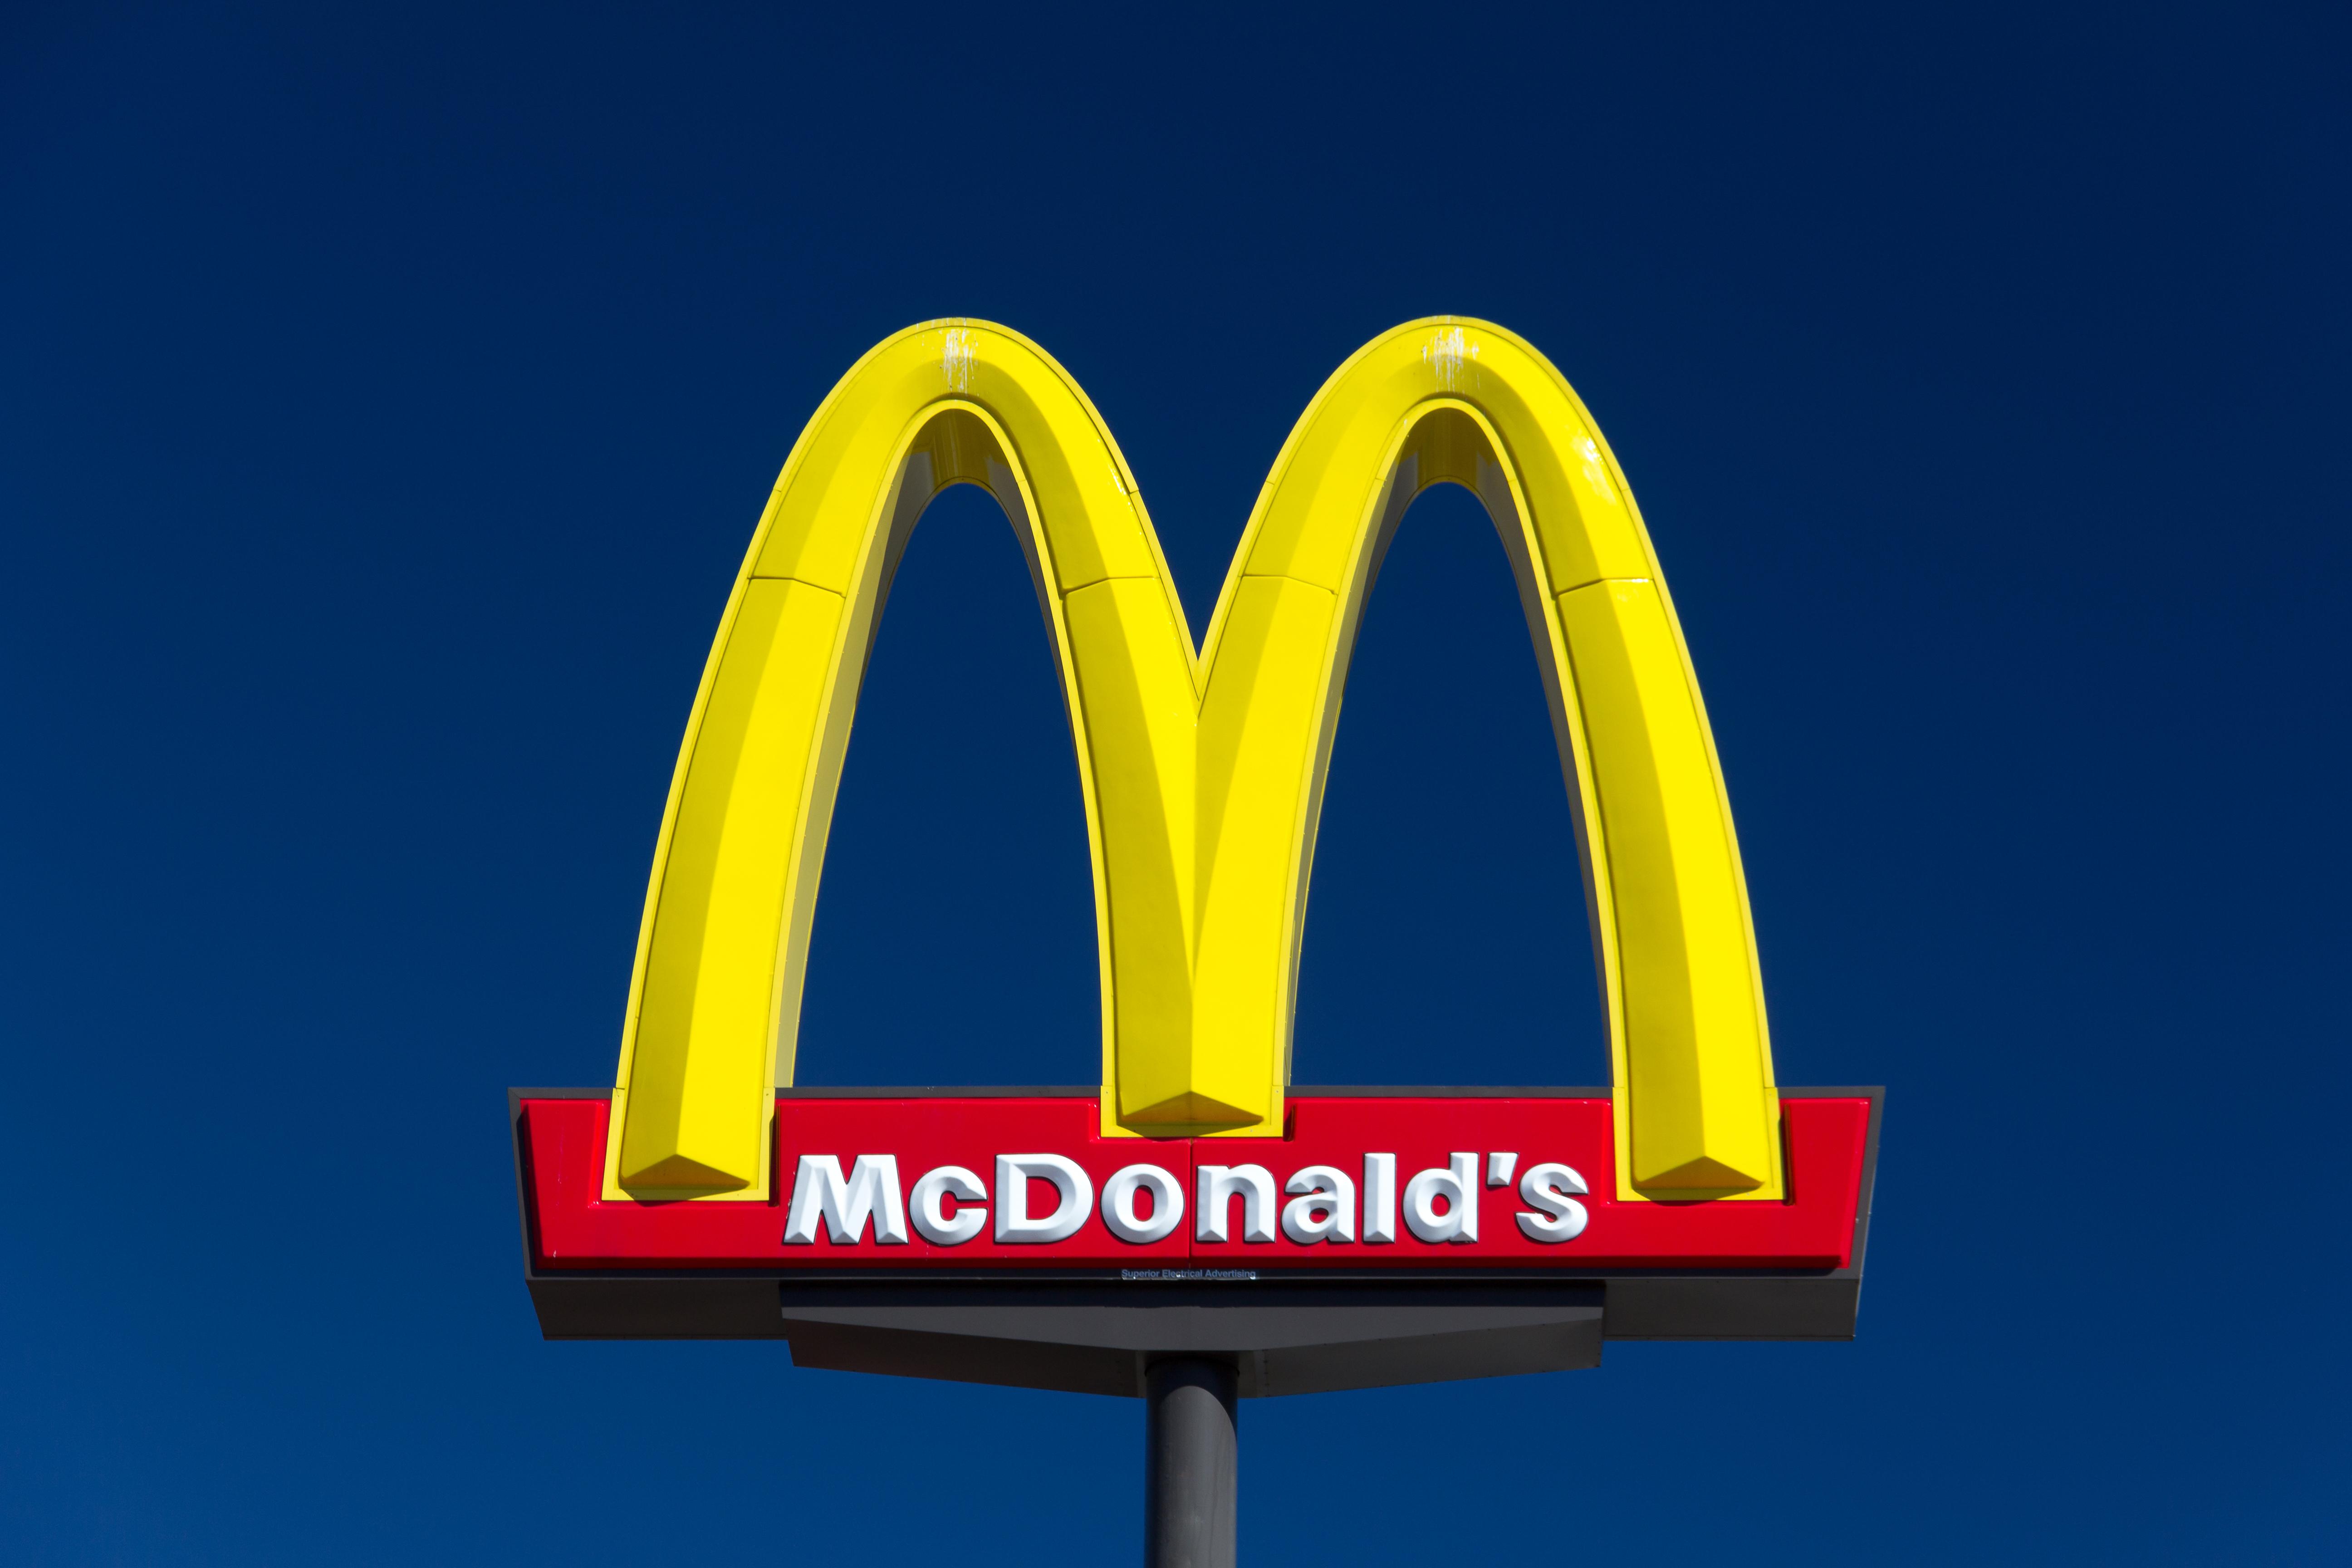 A McDonald's restaurant sign on a blue sky background.